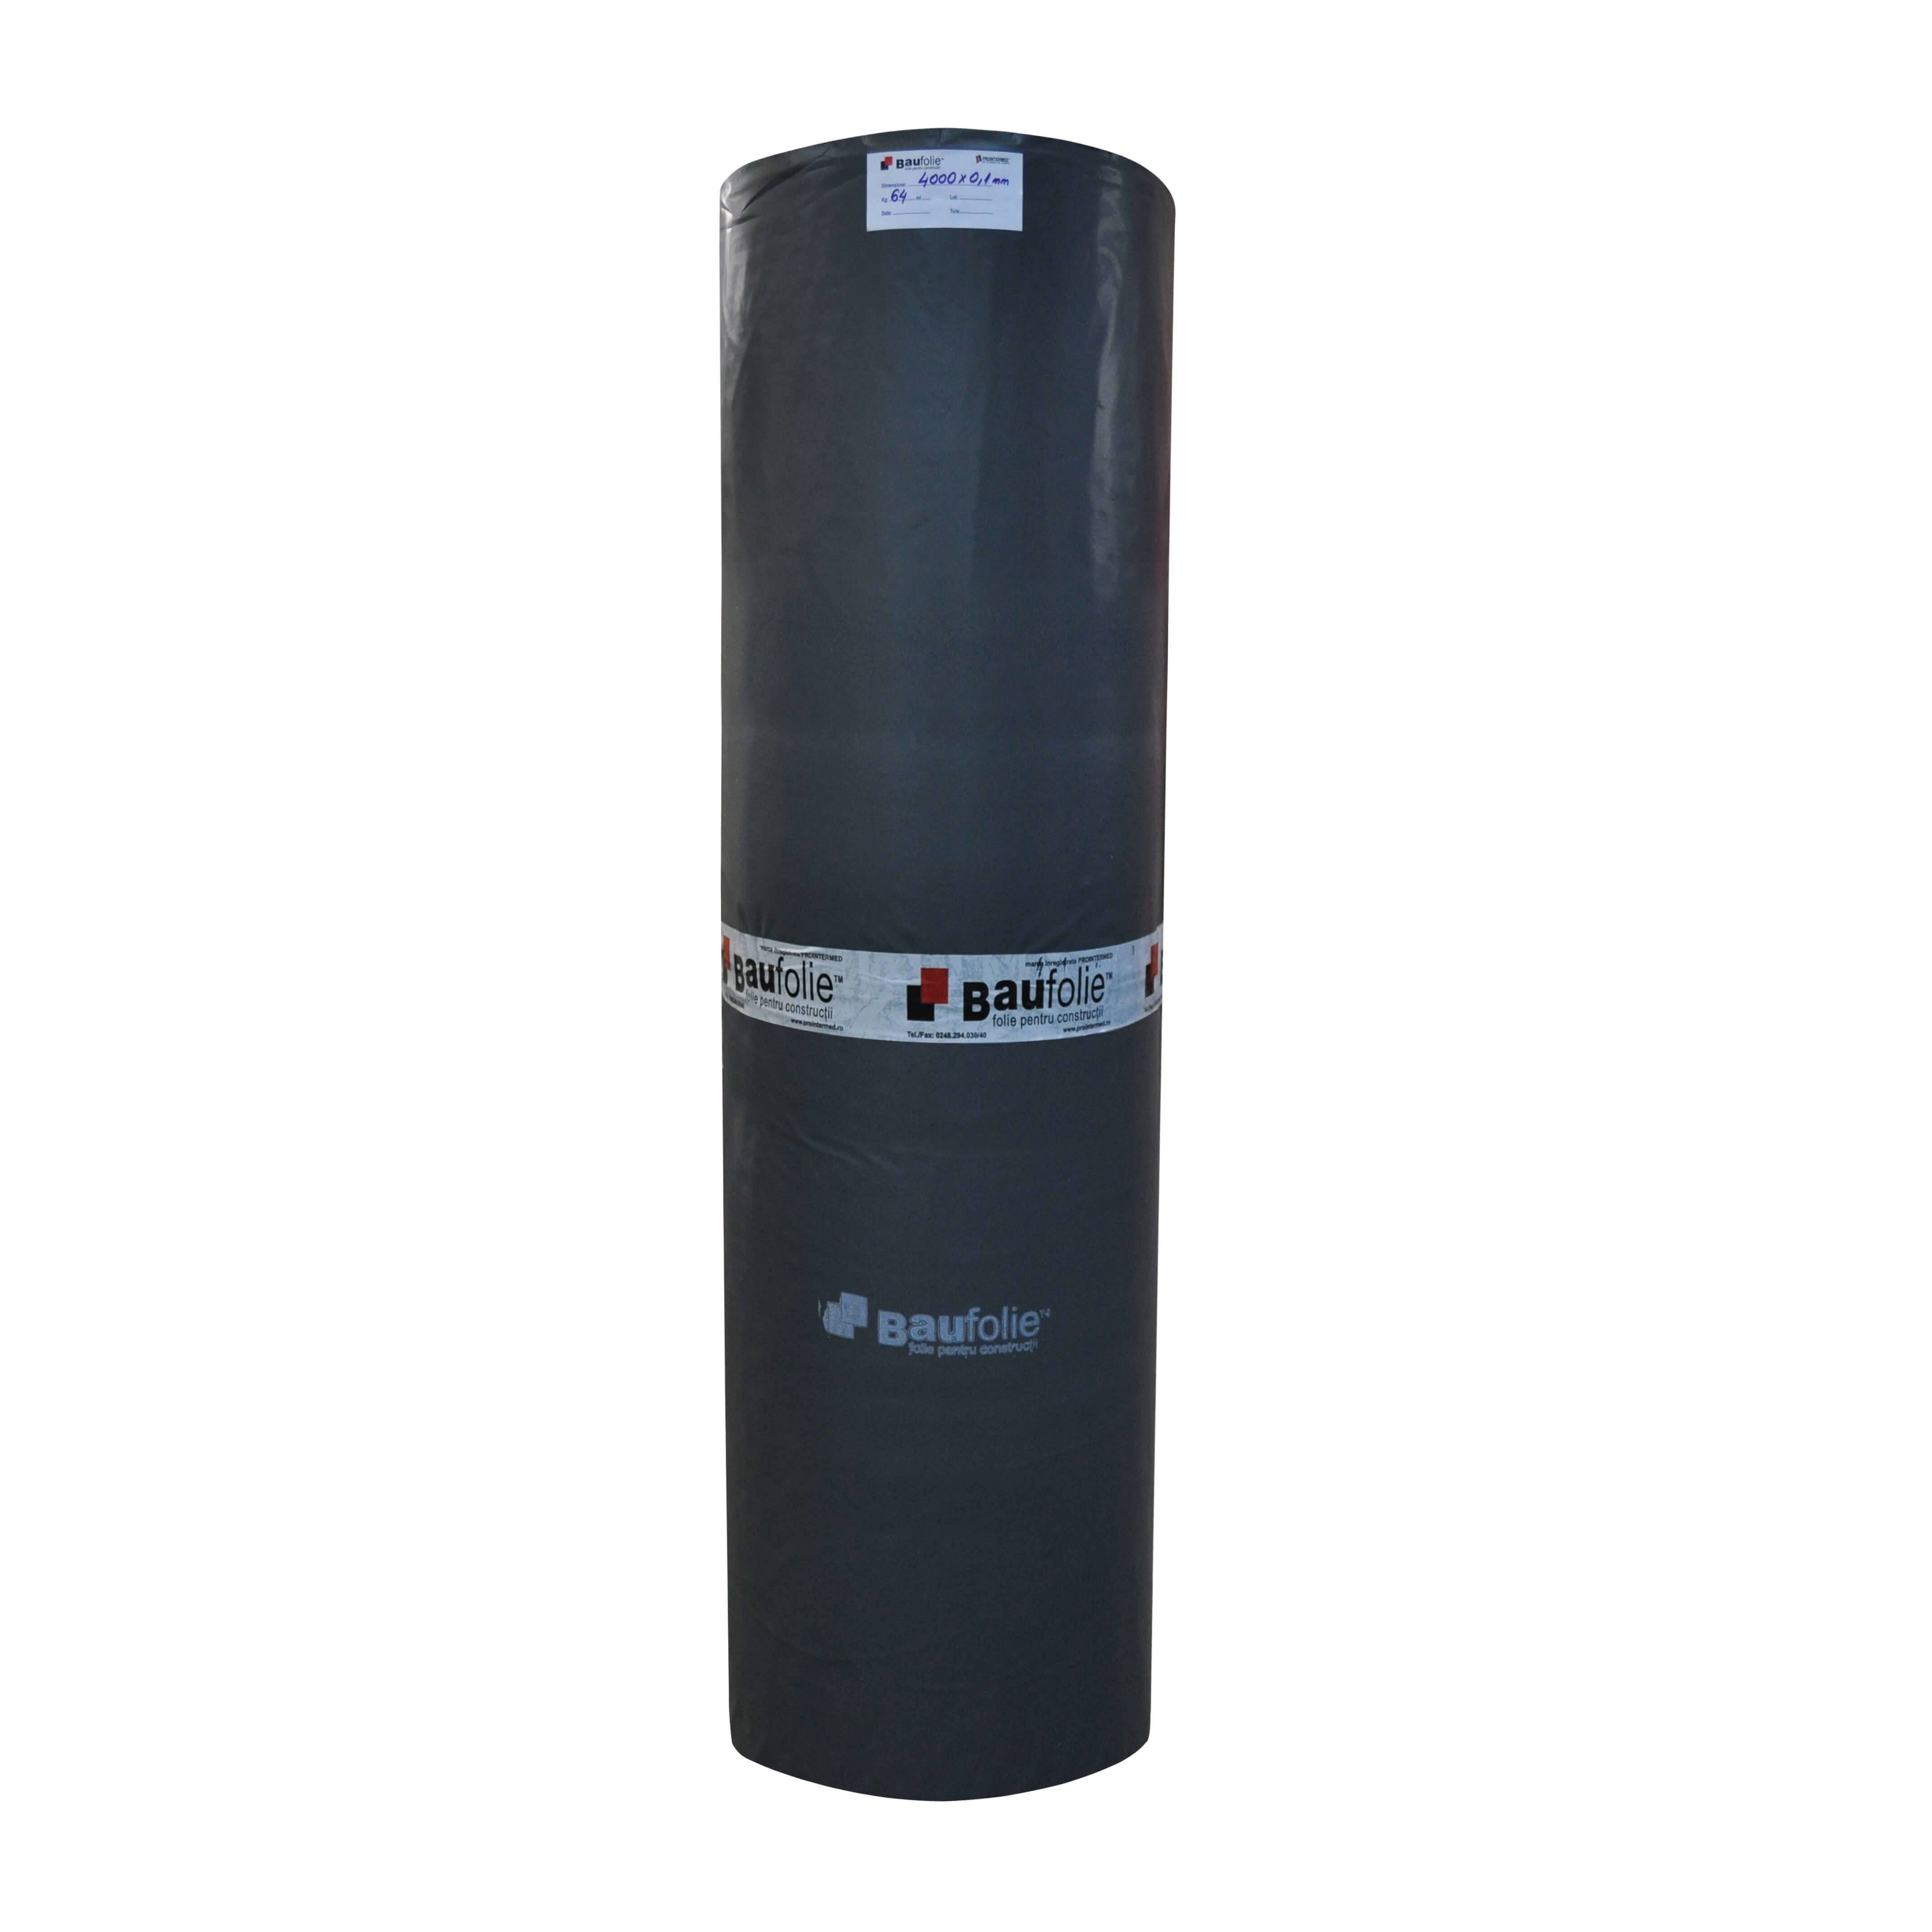 Folie polietilena Baufolie, PE reciclat, negru, grosime 0,12 mm, latime 4,2 m mathaus 2021